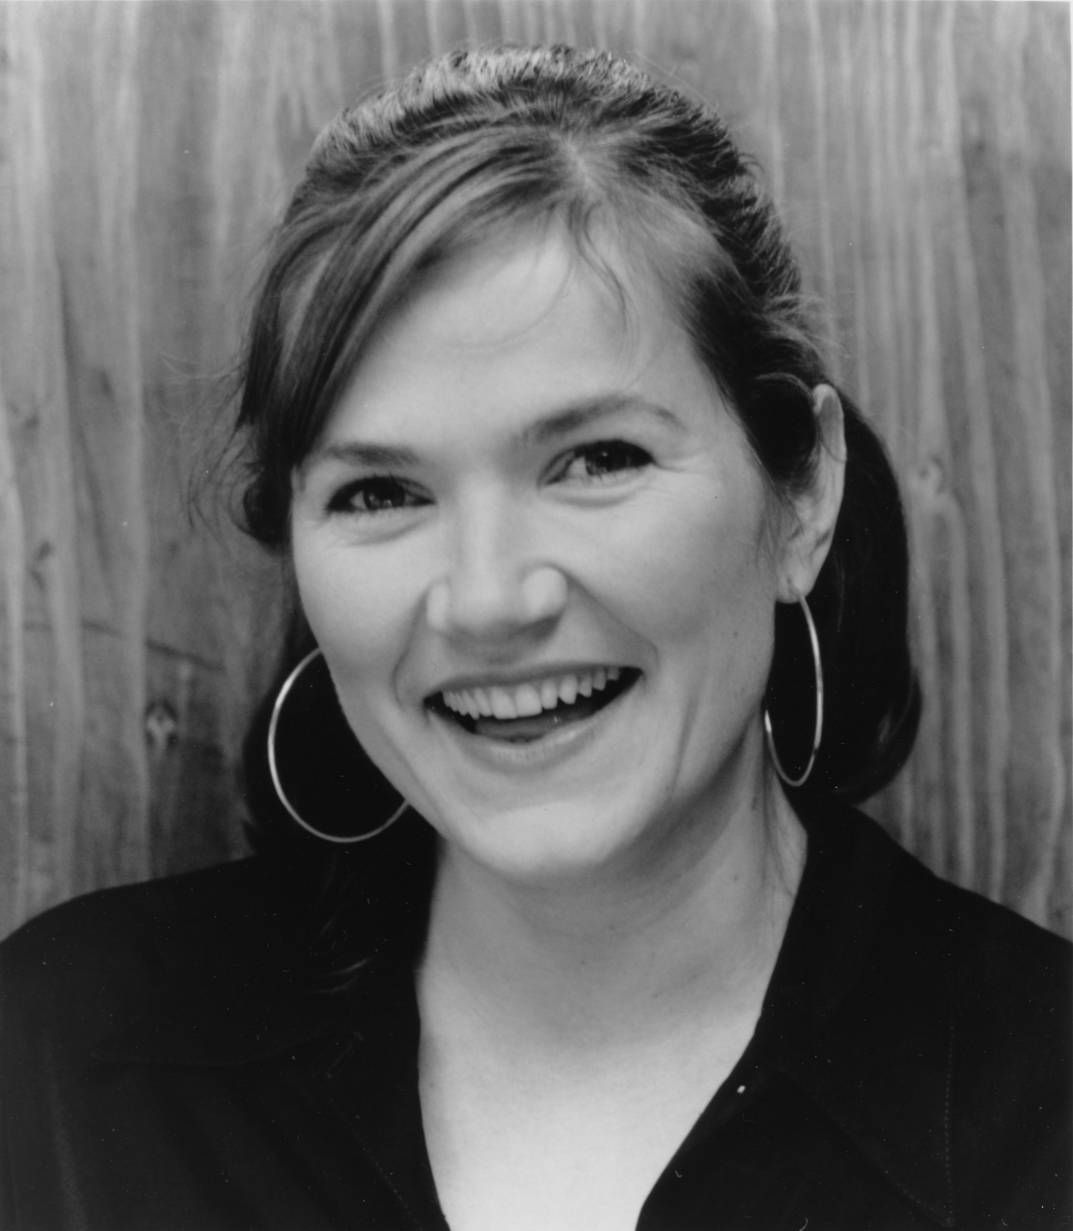 Jessica Hynes (born 1972)